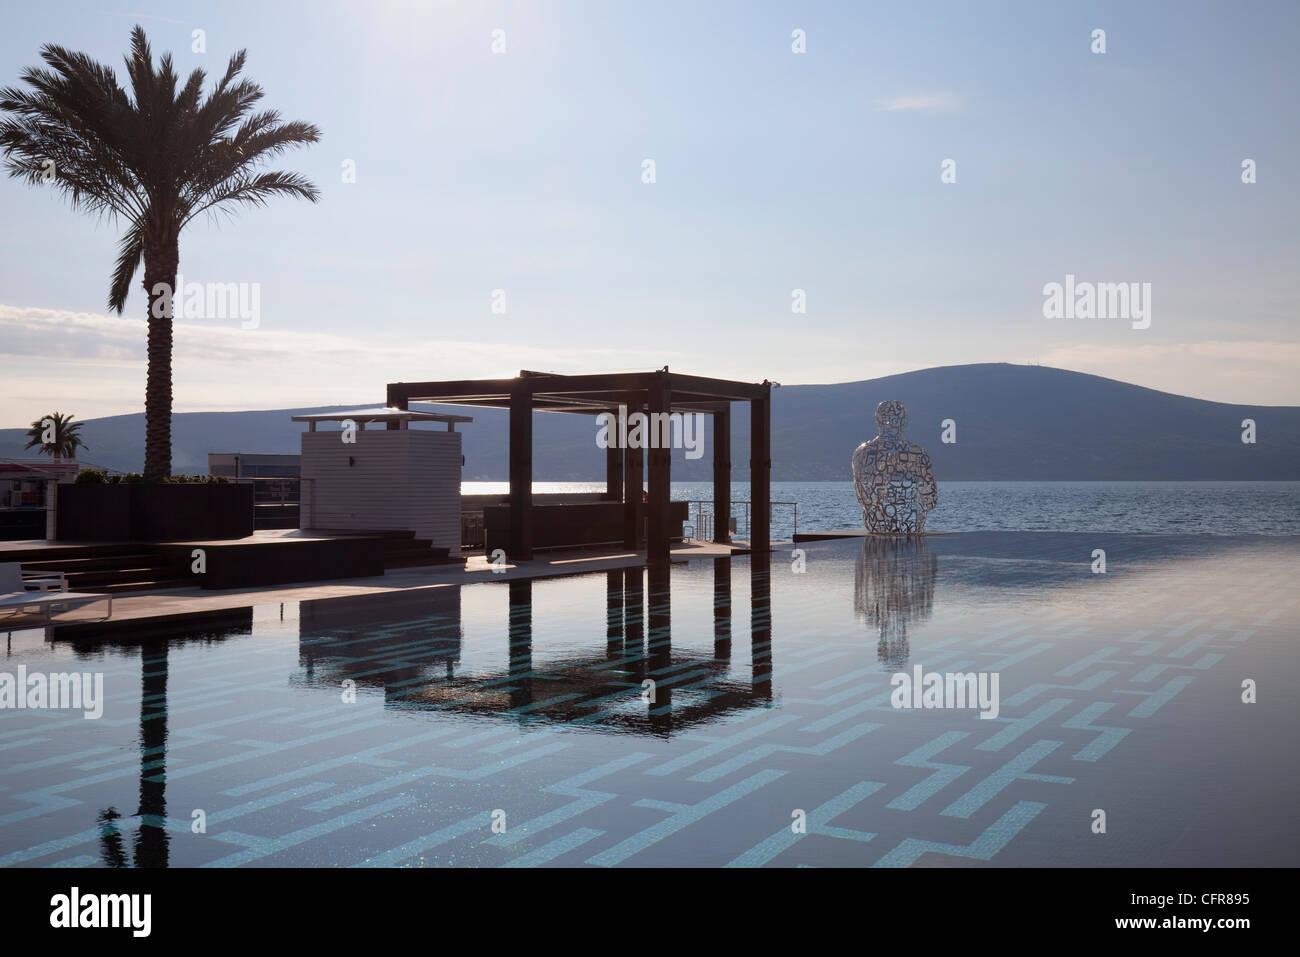 The Lido Mar swimming pool at the newly developed Marina in Porto Montenegro, Montenegro, Europe - Stock Image